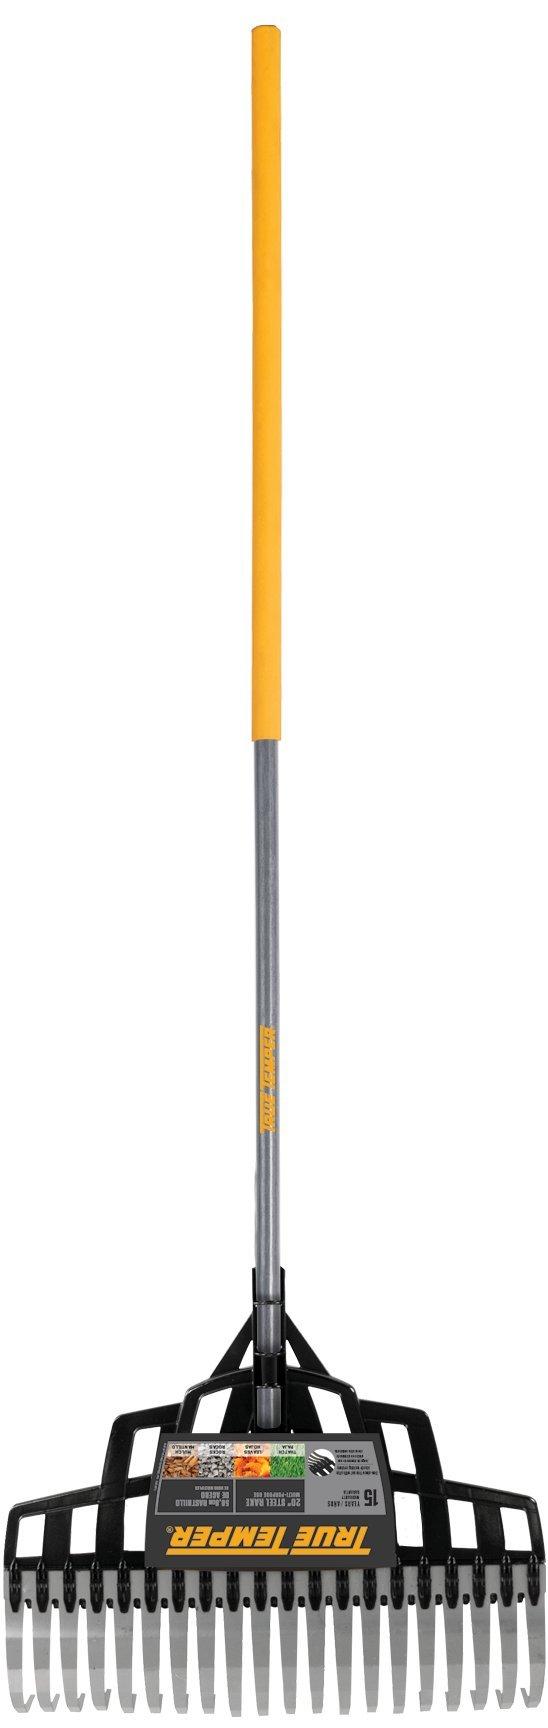 True Temper 20-Inch Multi-Purpose Steel Lawn Rake - 2000TT